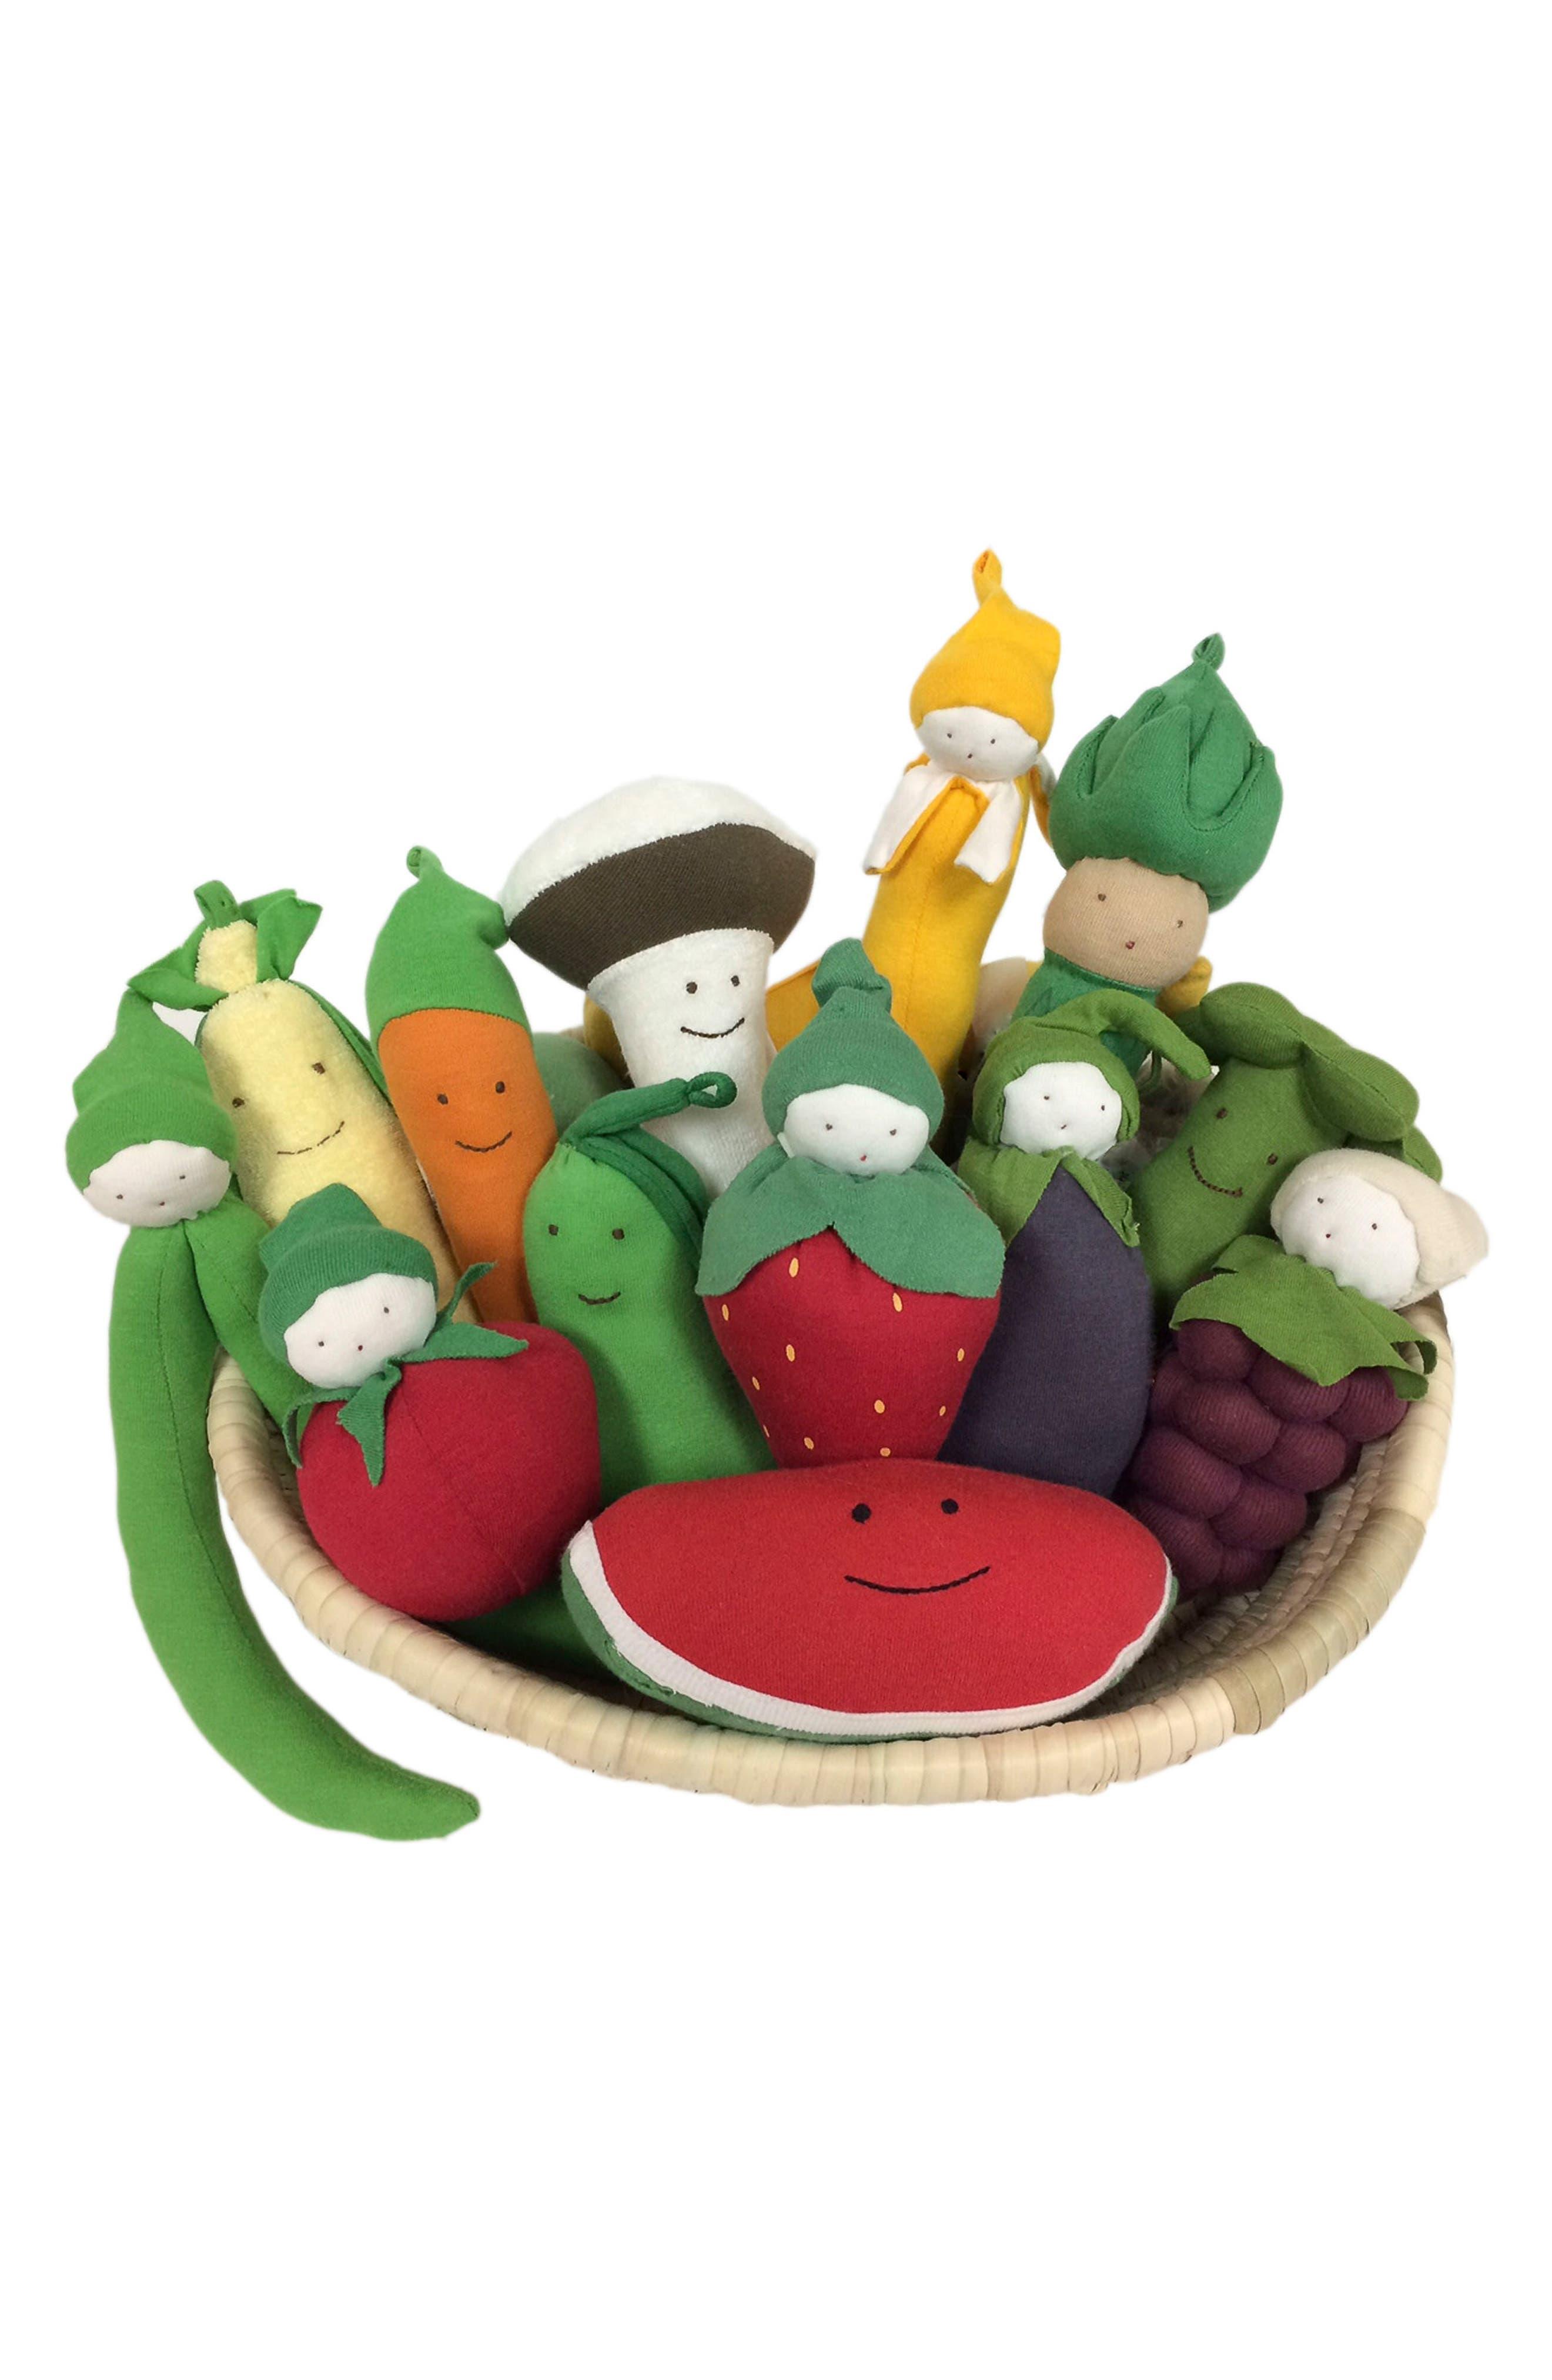 14-Piece Stuffed Fruit & Vegetable Basket,                         Main,                         color, Brown